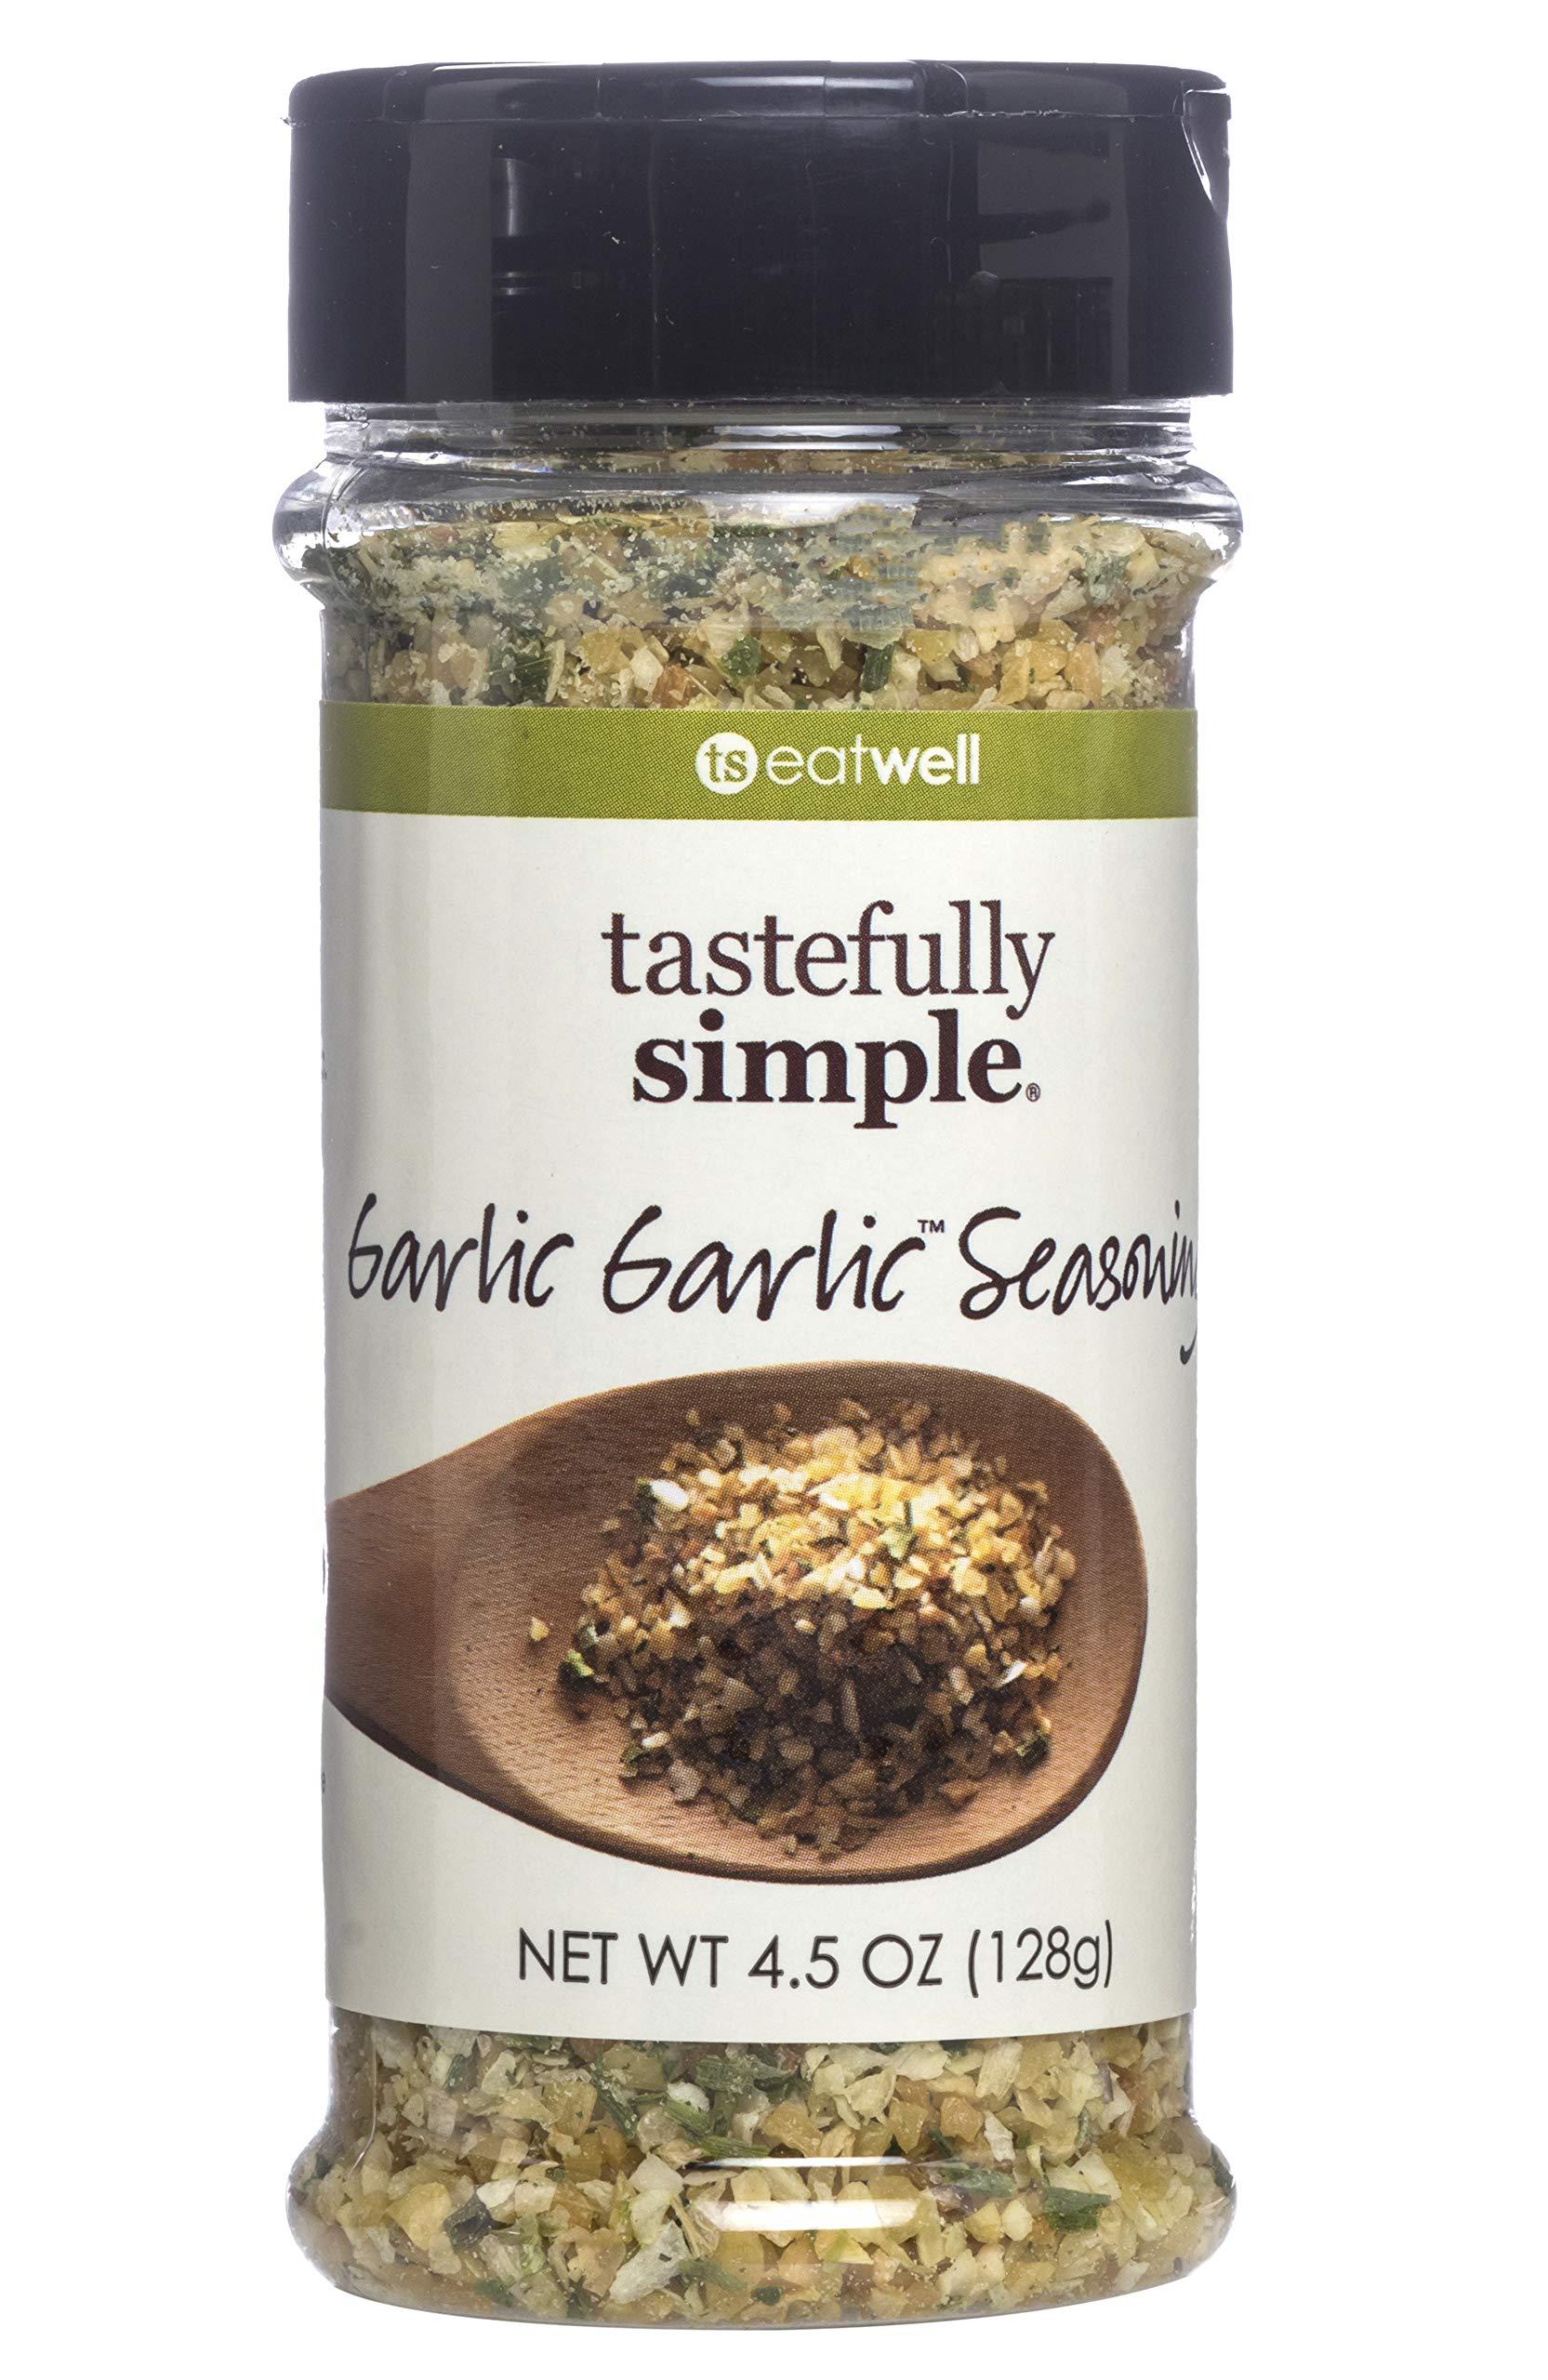 Tastefully Simple Garlic Garlic Seasoning Blend, No MSG, All Natural, No Preservatives, and Kosher